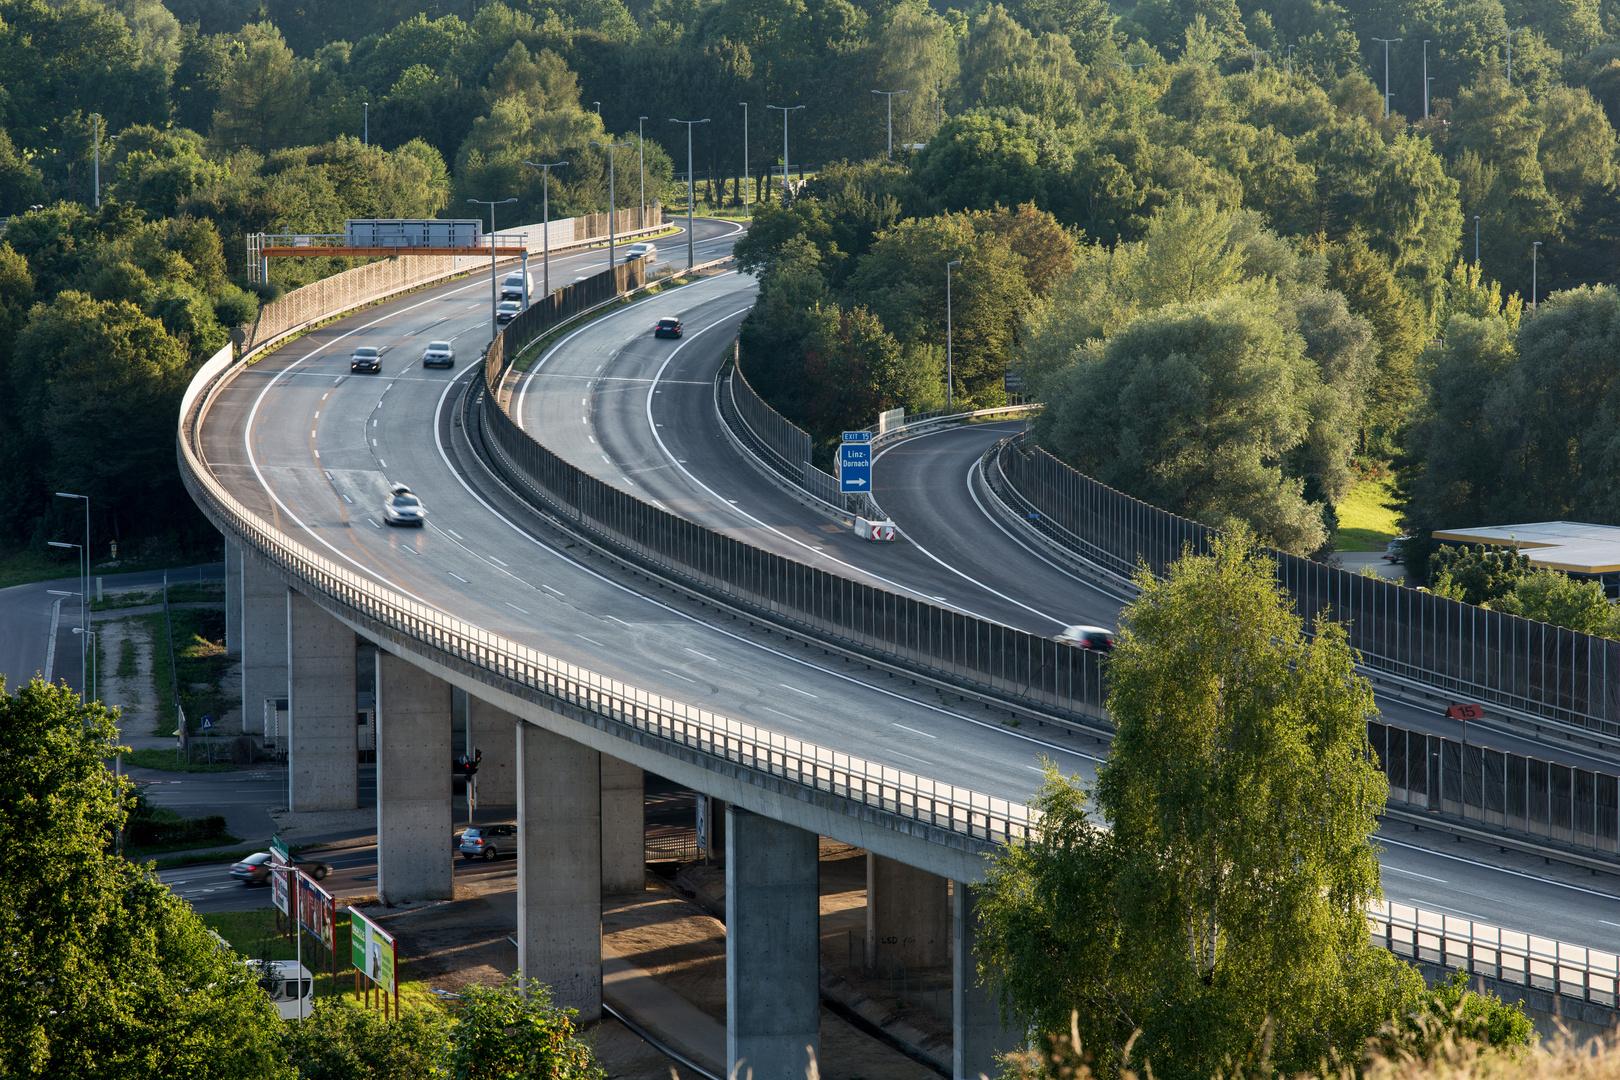 Autobahnabfahrt Linz Dornach (A)